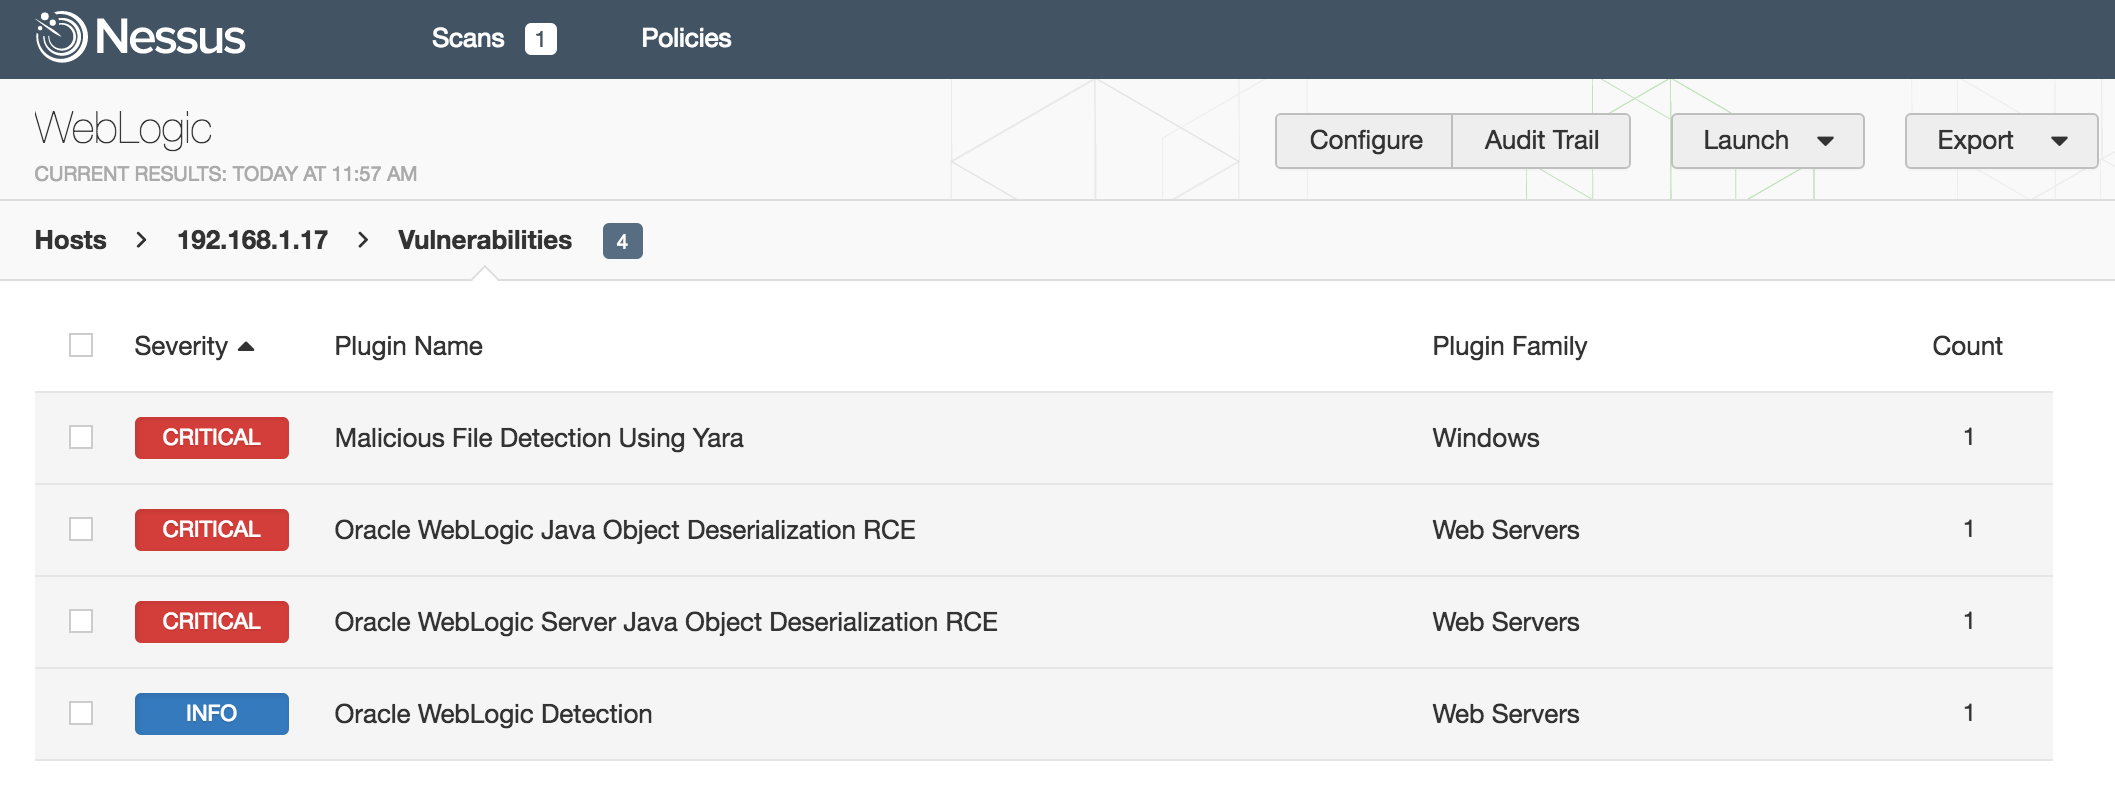 Nessus WebLogic scan with YARA rule